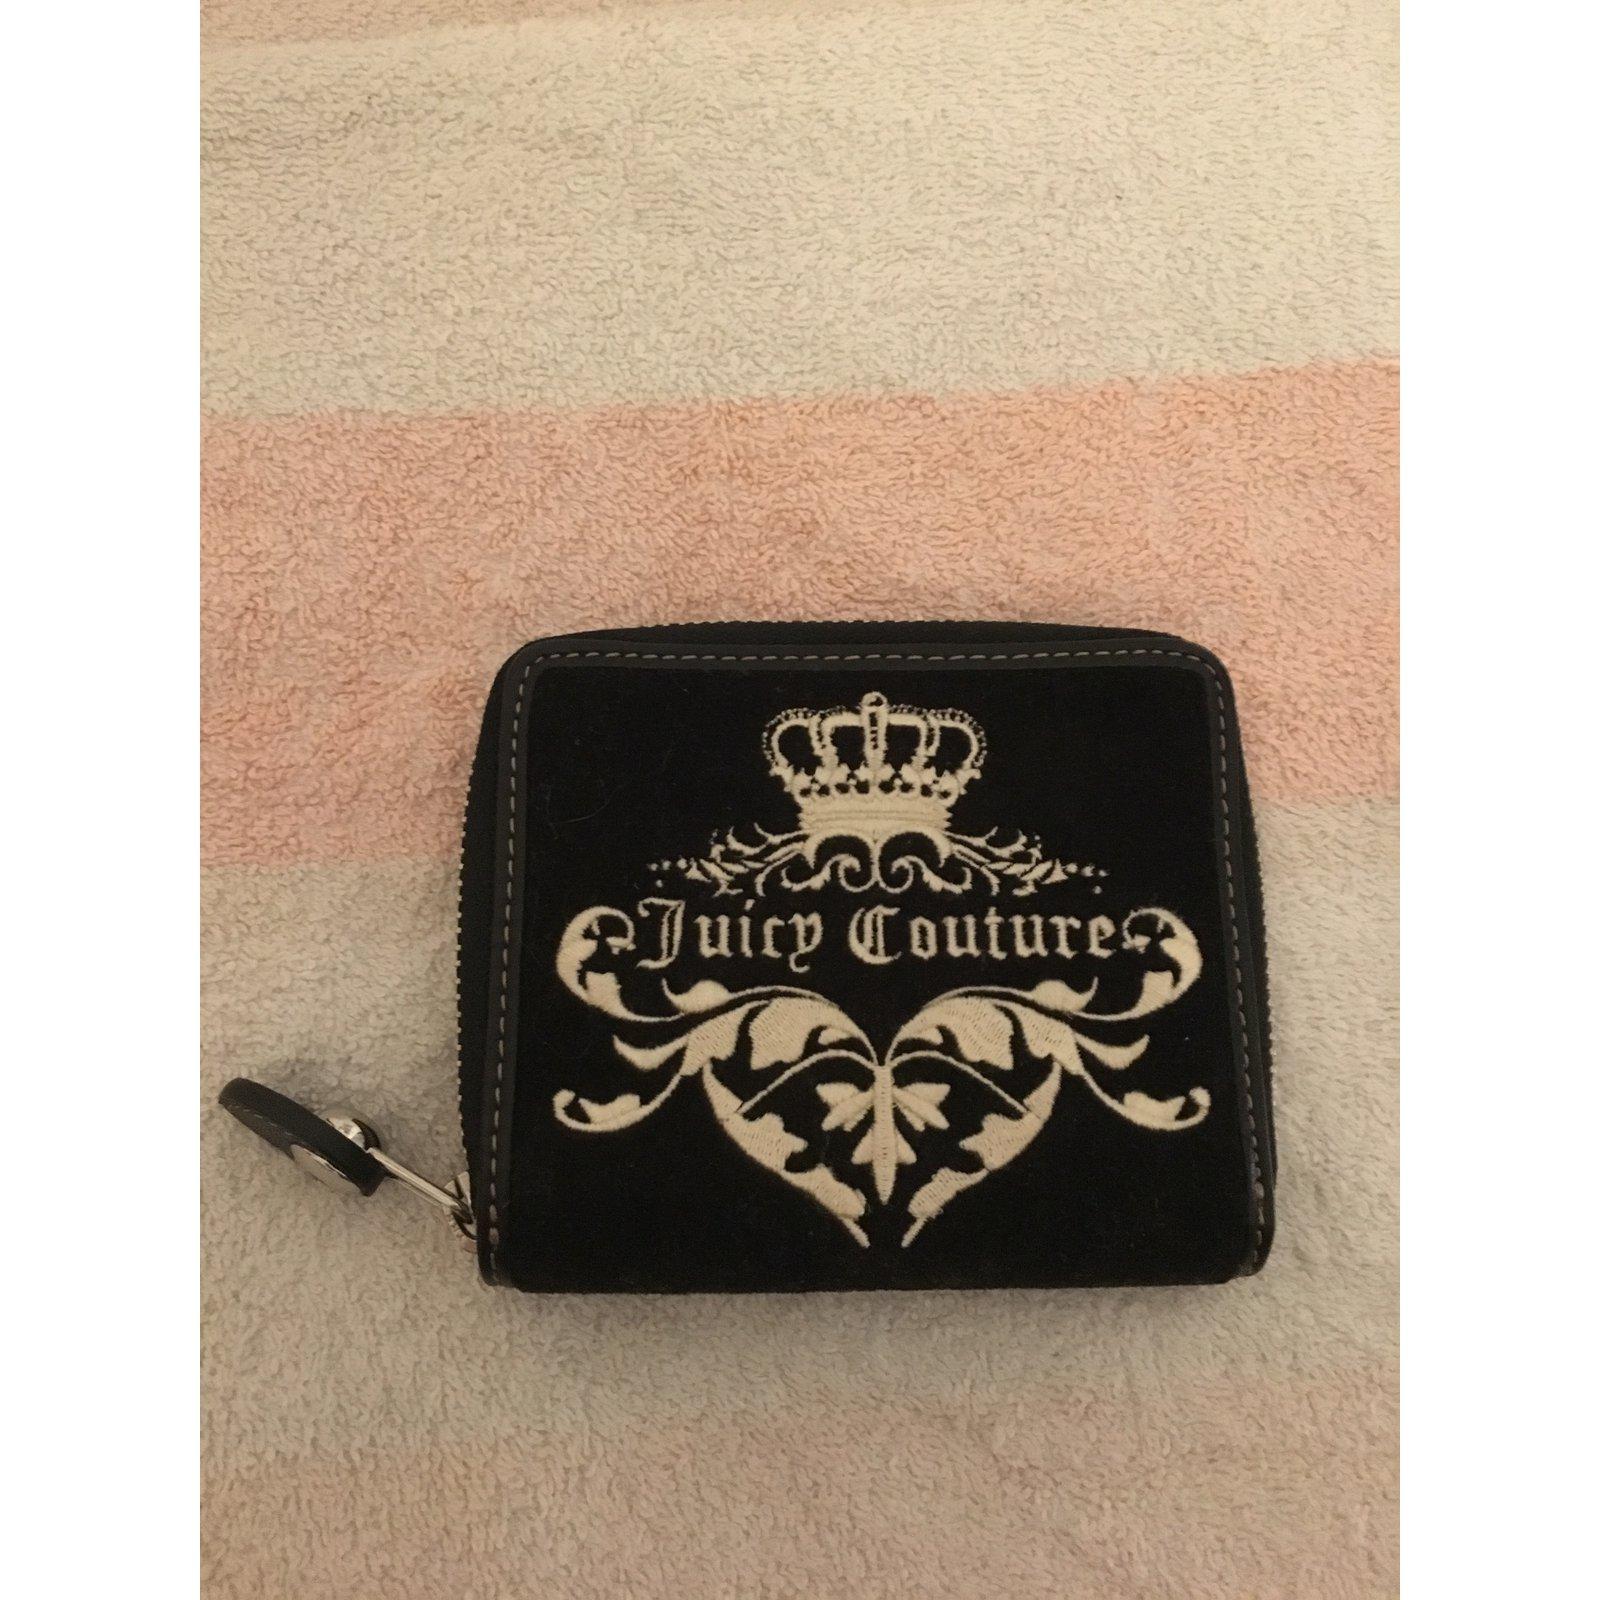 Juicy Couture Wallet Wallets Velvet Black ref.38979 - Joli Closet a0cfadef55282